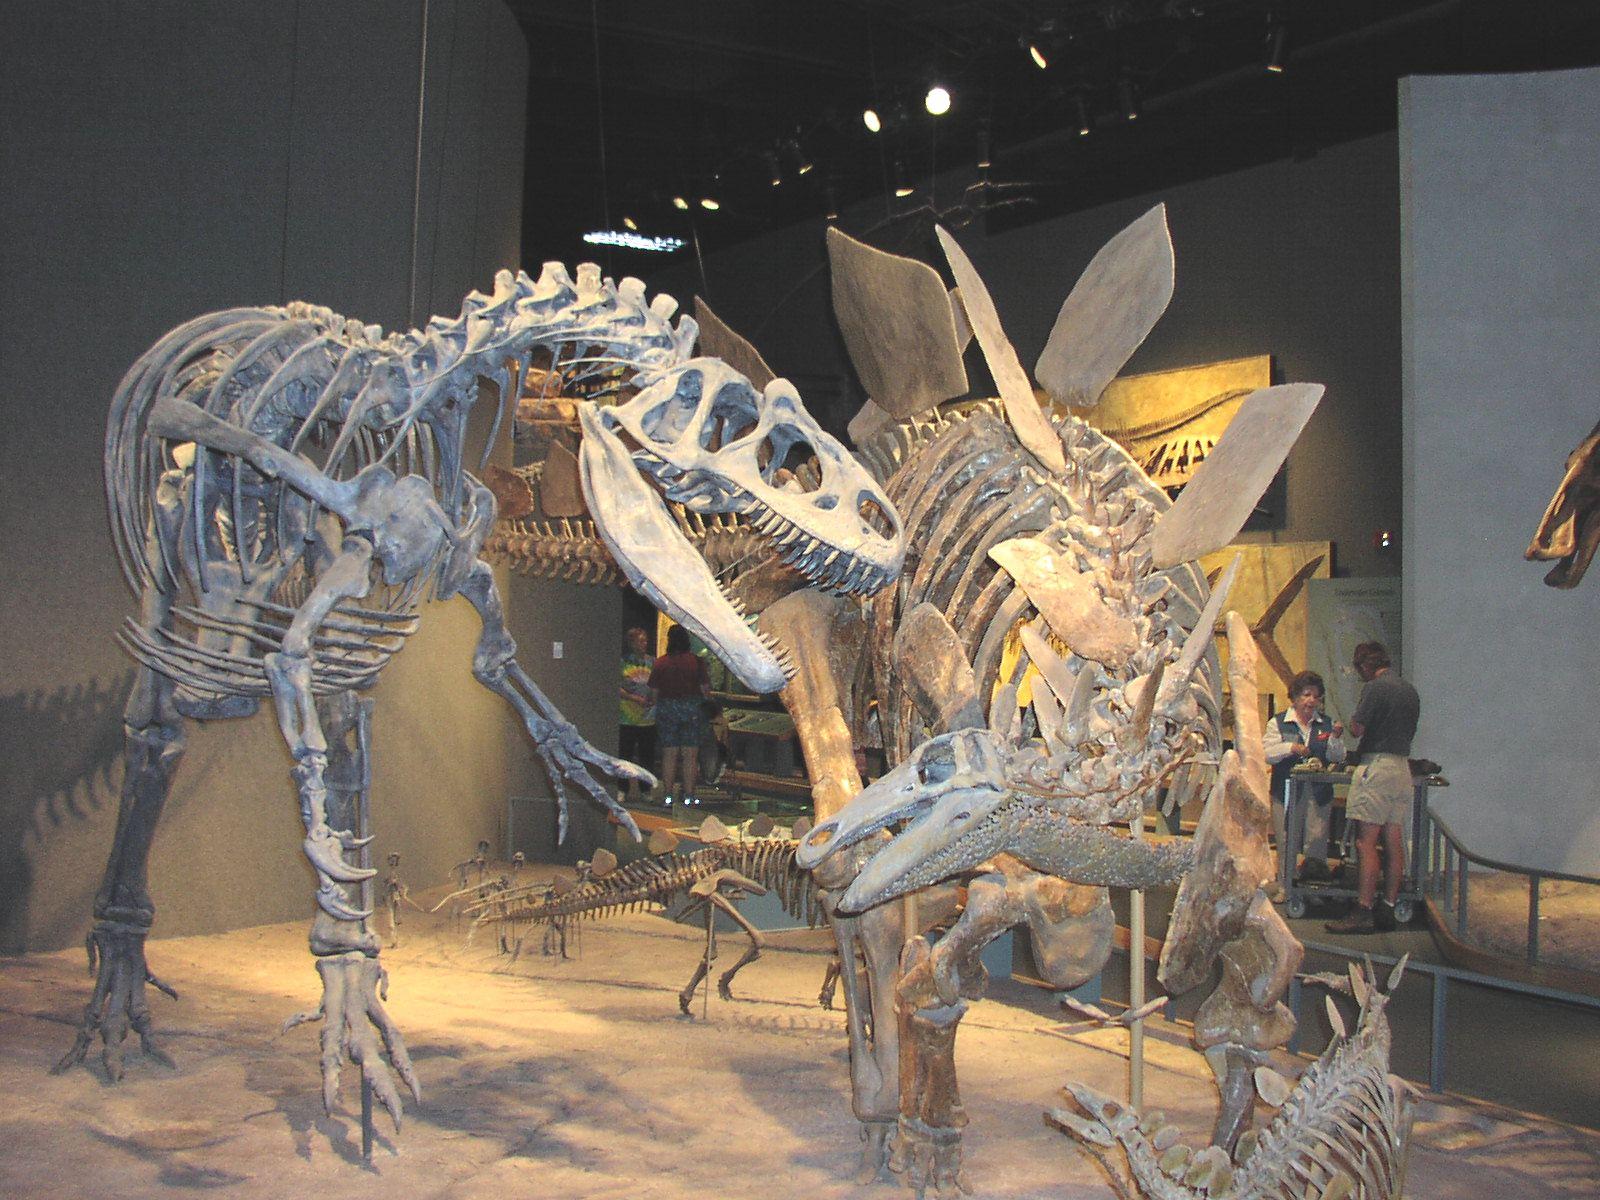 Trex Vs Stegosaurus